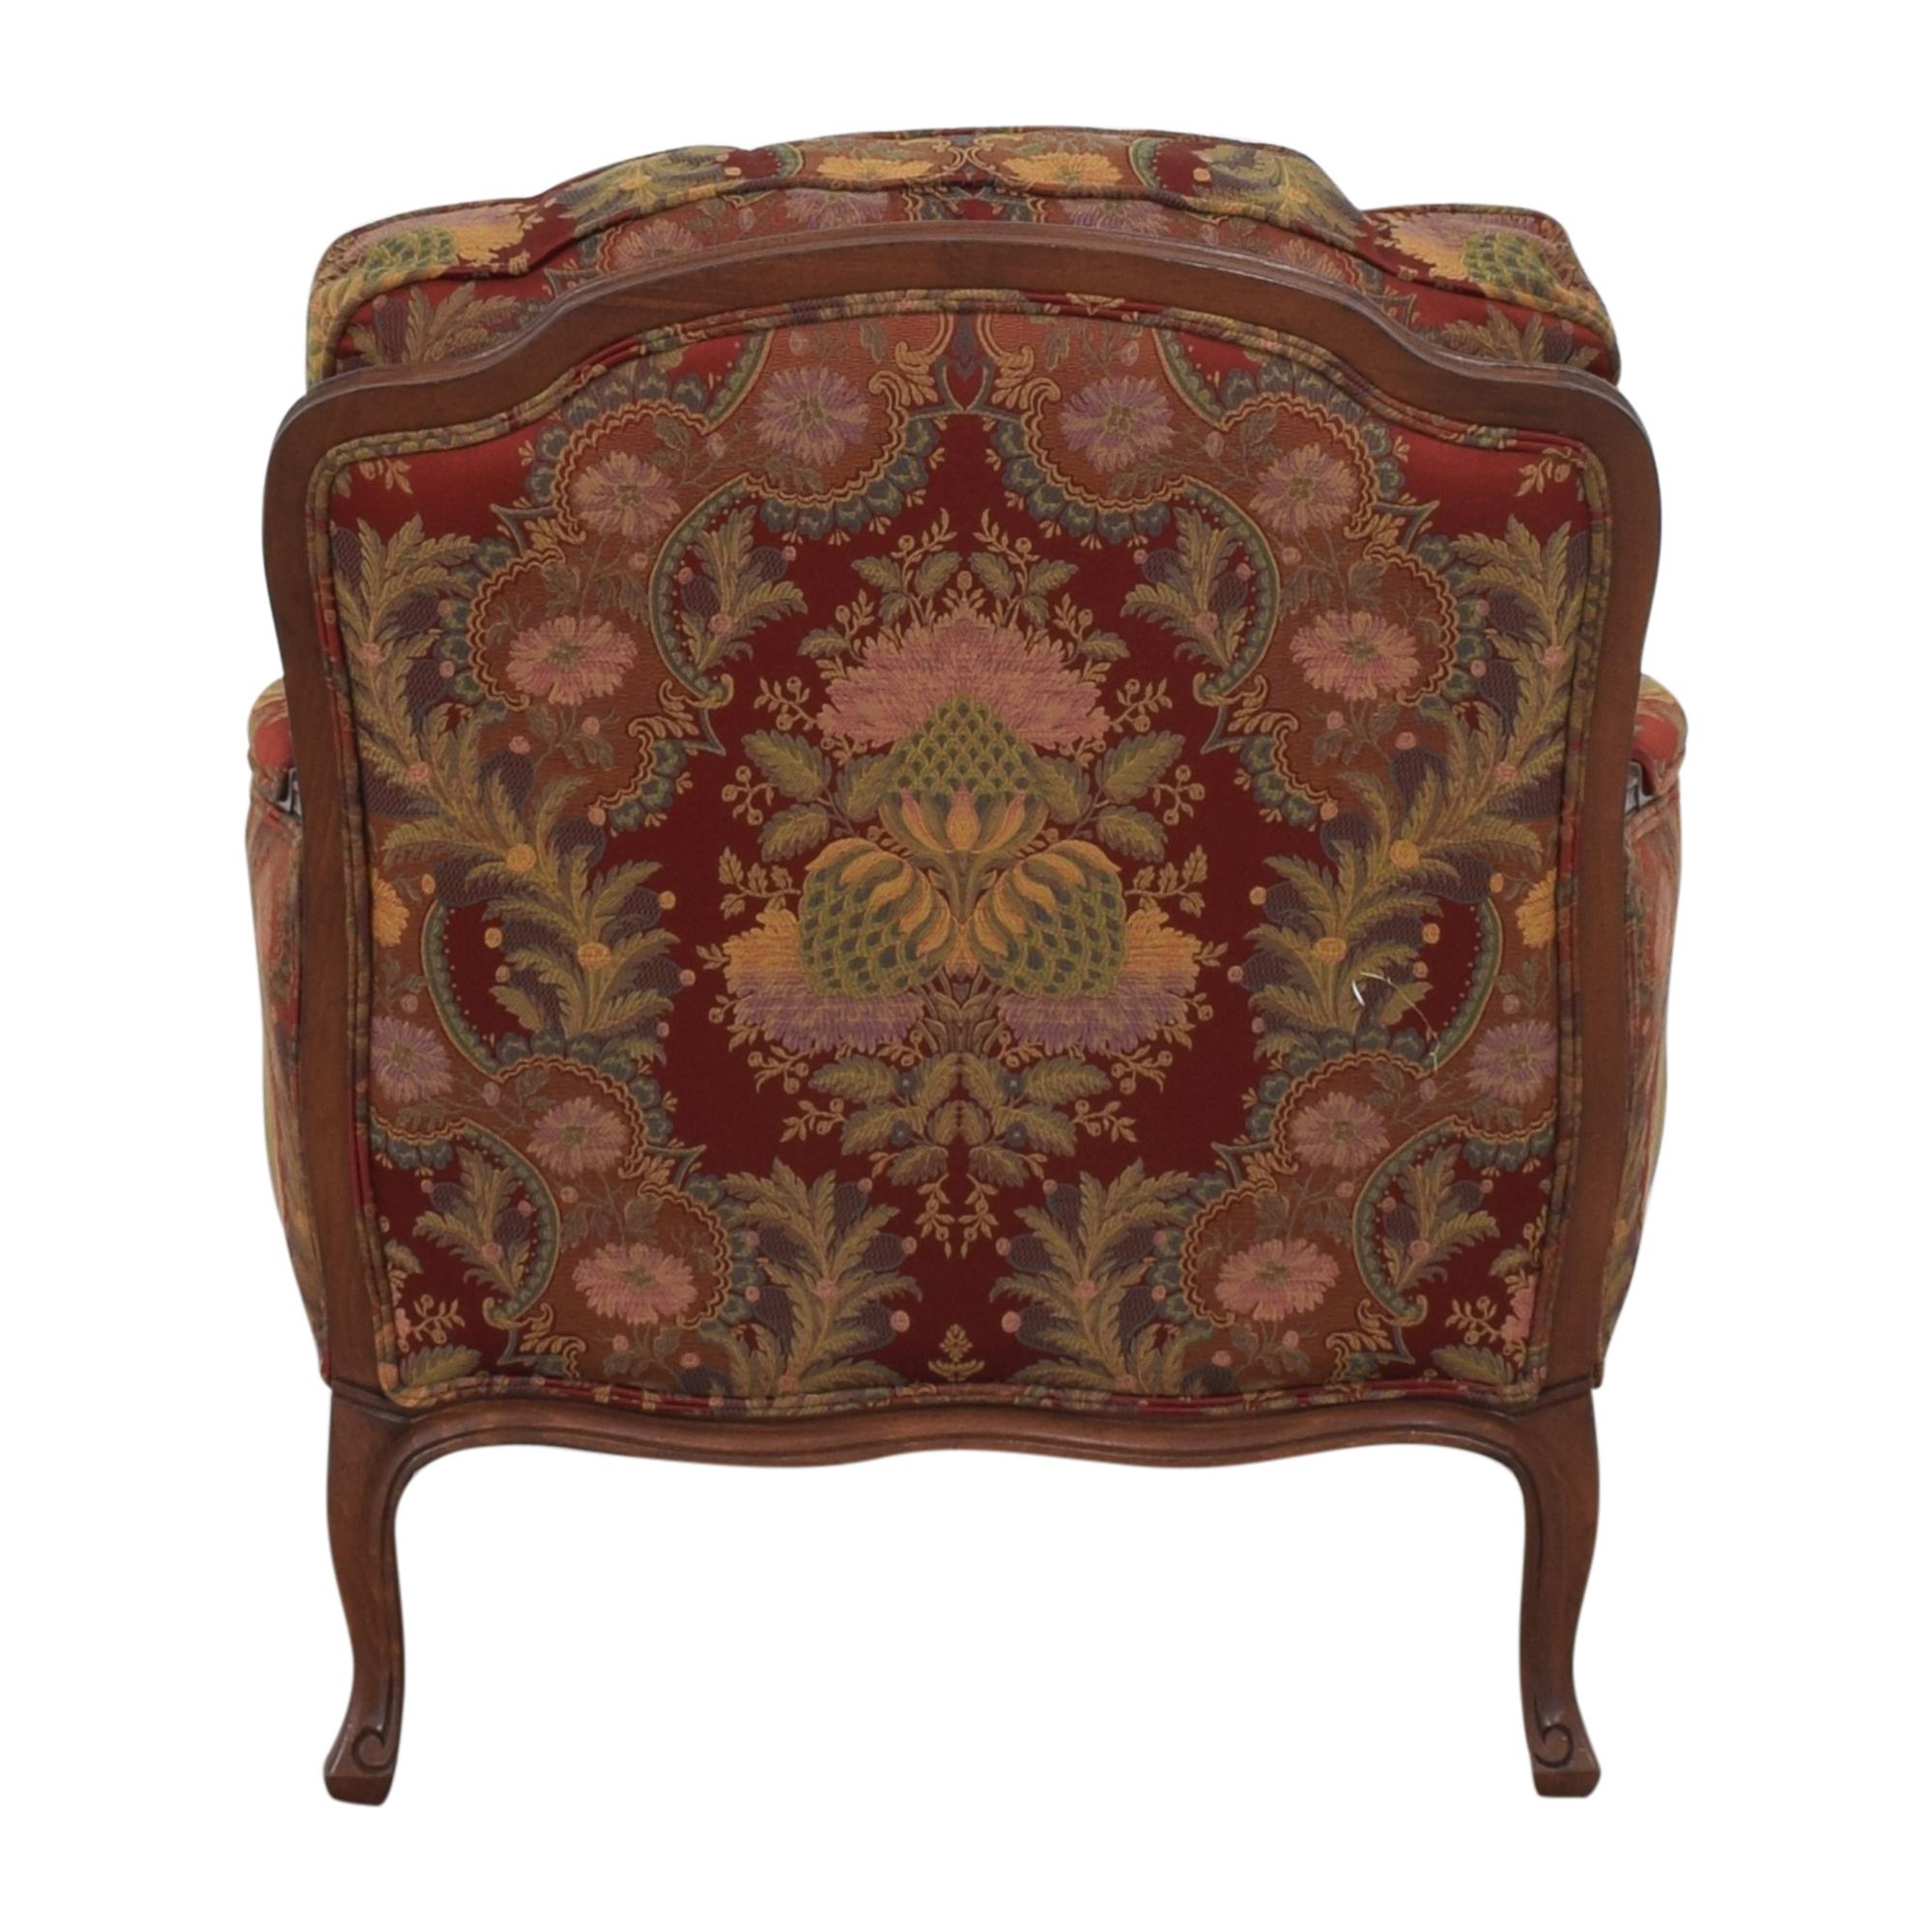 shop Ethan Allen Versailles Chair with Ottoman Ethan Allen Chairs